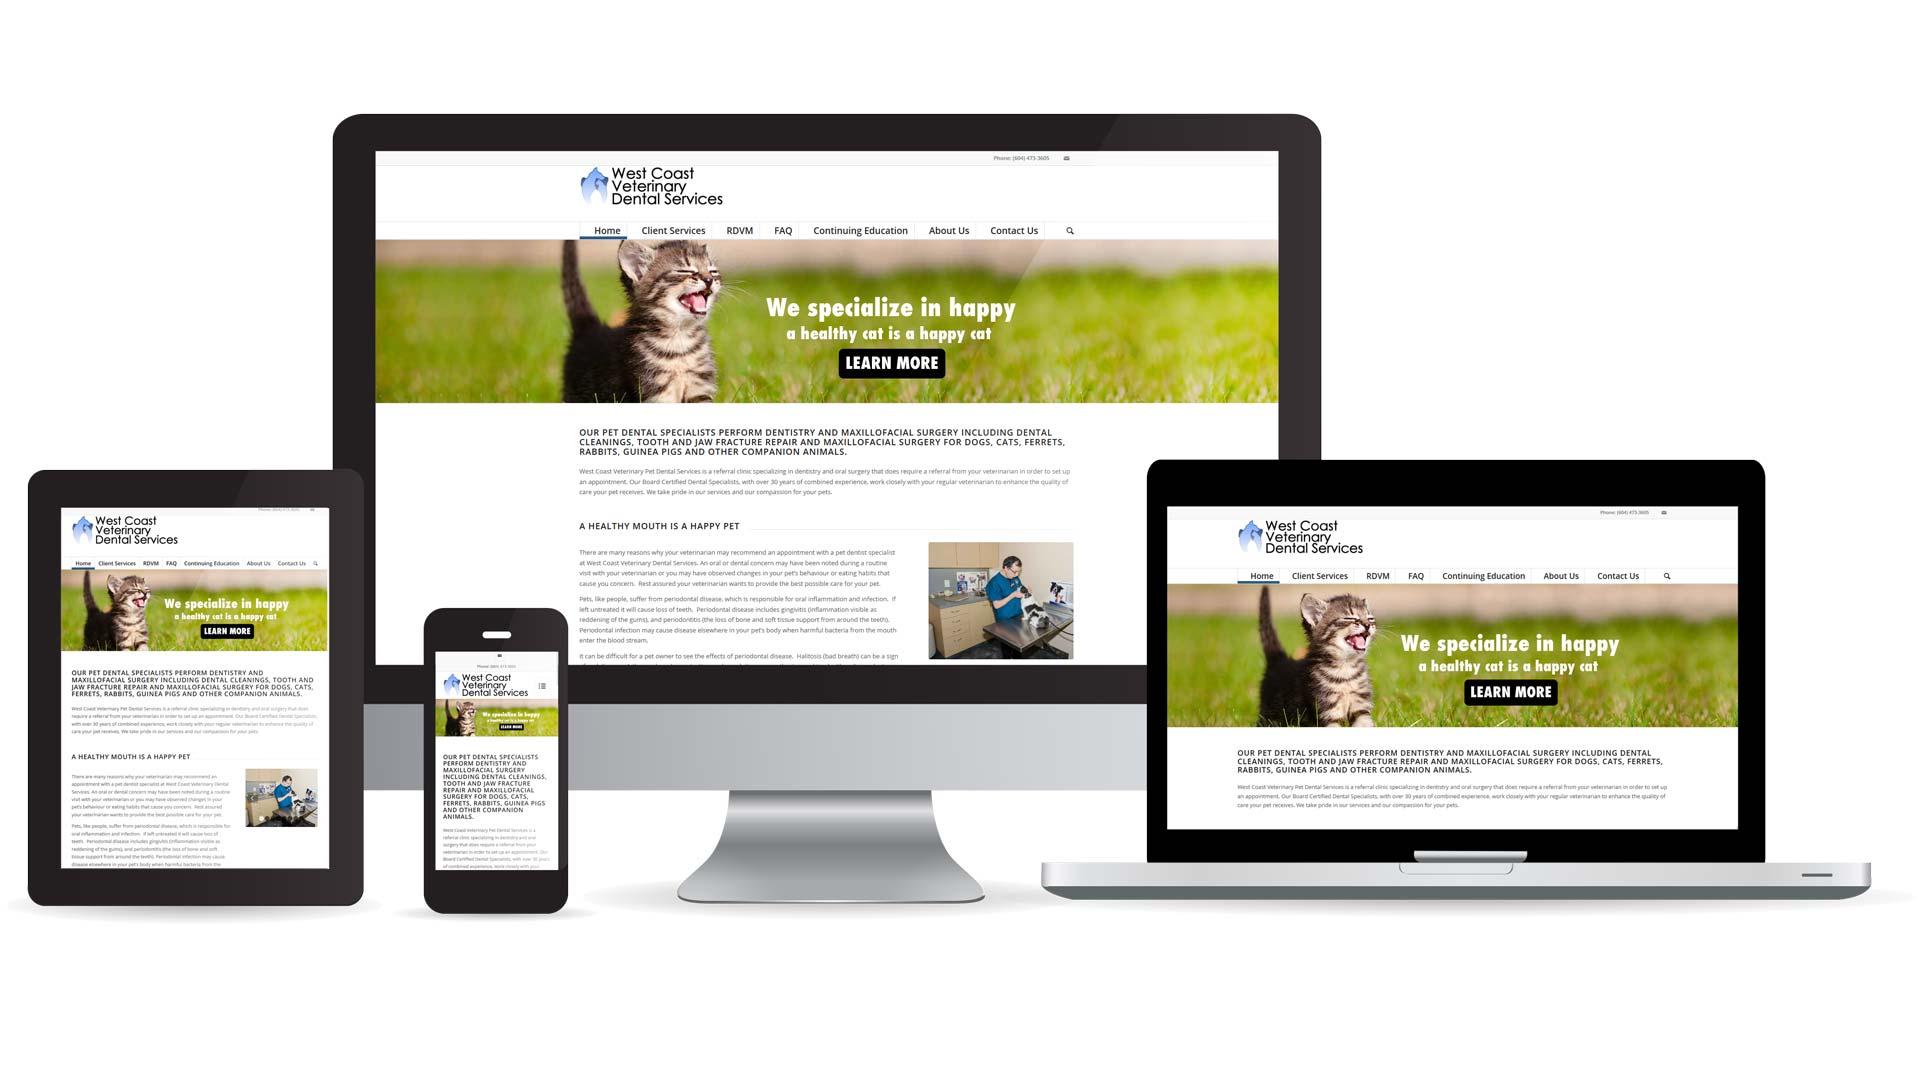 West Coast Veterinary Dental Services website multidevice layout